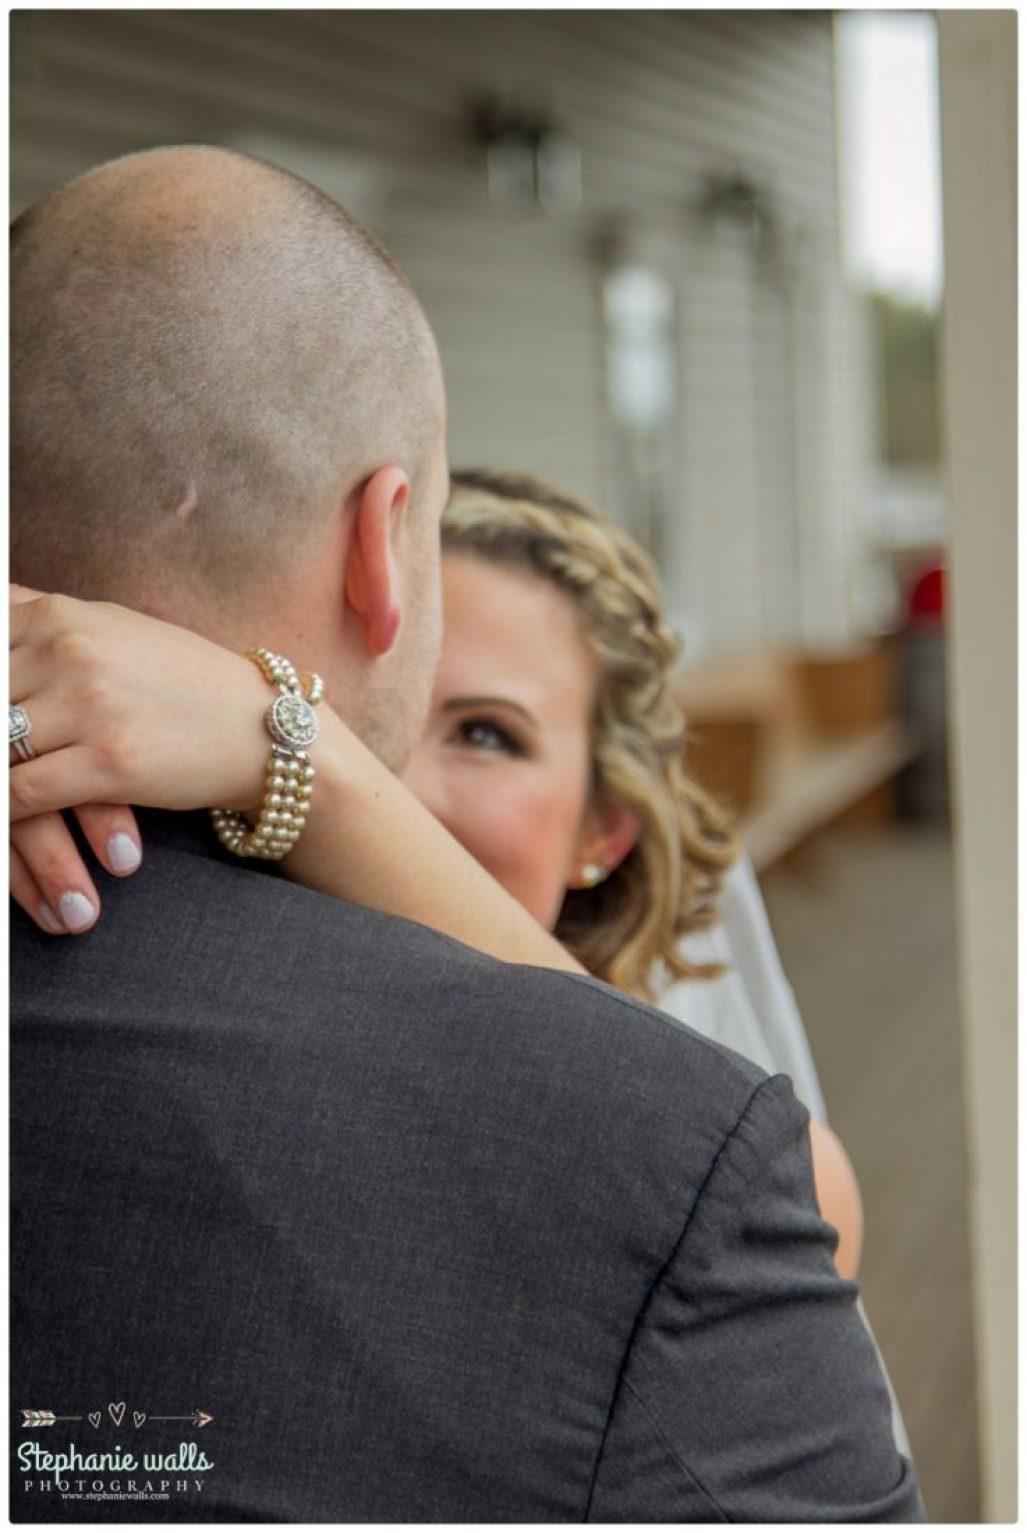 2016 03 24 0012 1 Racing Love   Snohomish Event Center   Snohomish Wedding Photographer